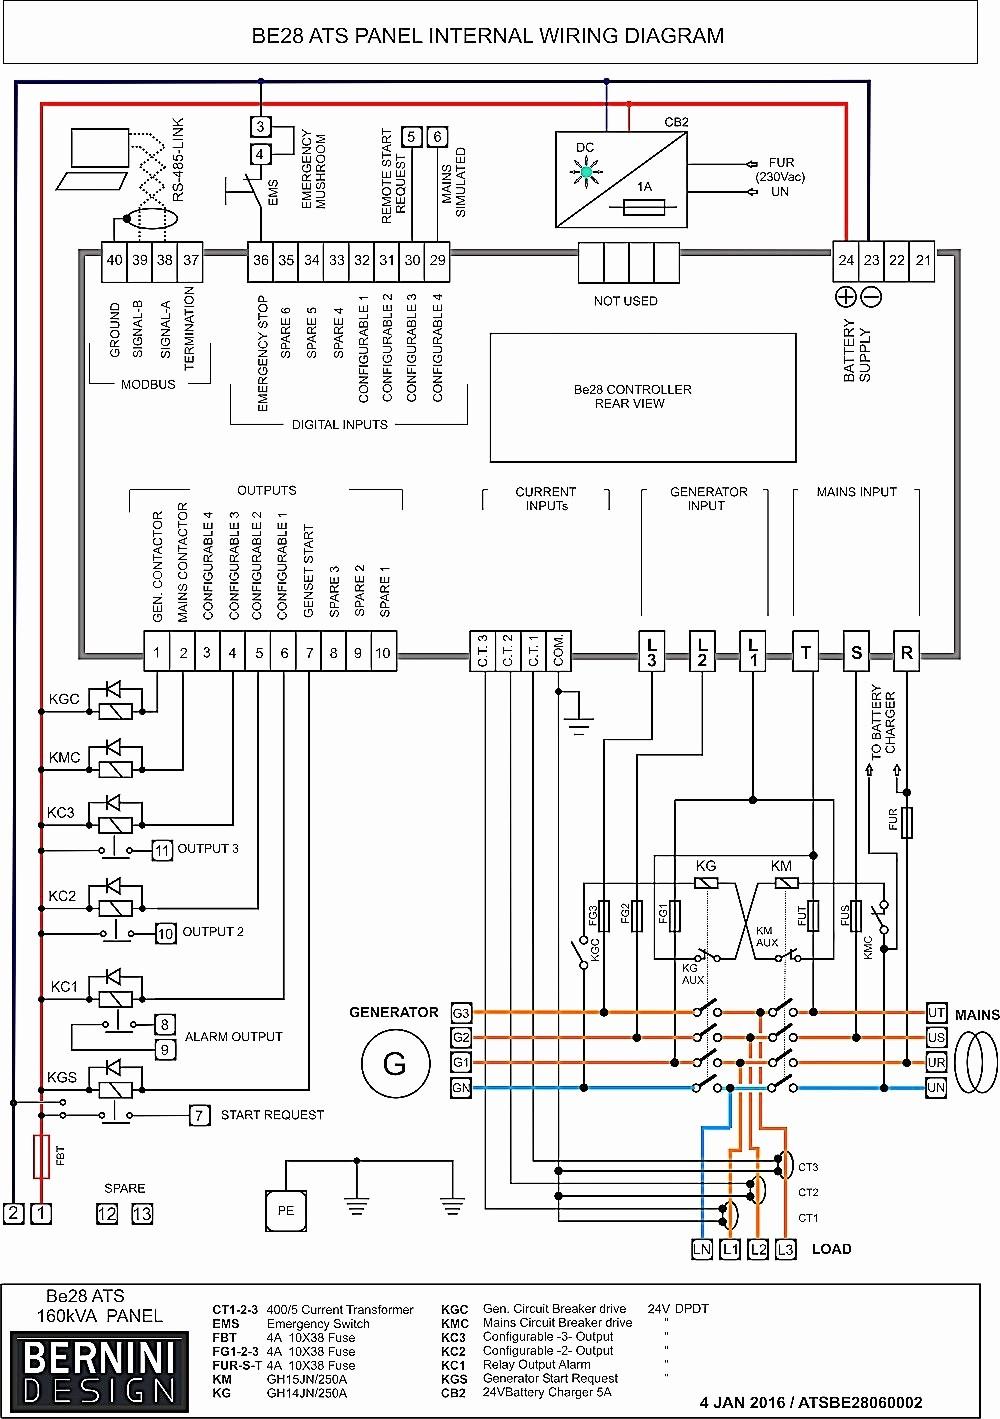 Full Size of Wiring Diagram Generac Automatic Transfer Switch Wiring Diagram New Generac Automatic Transfer